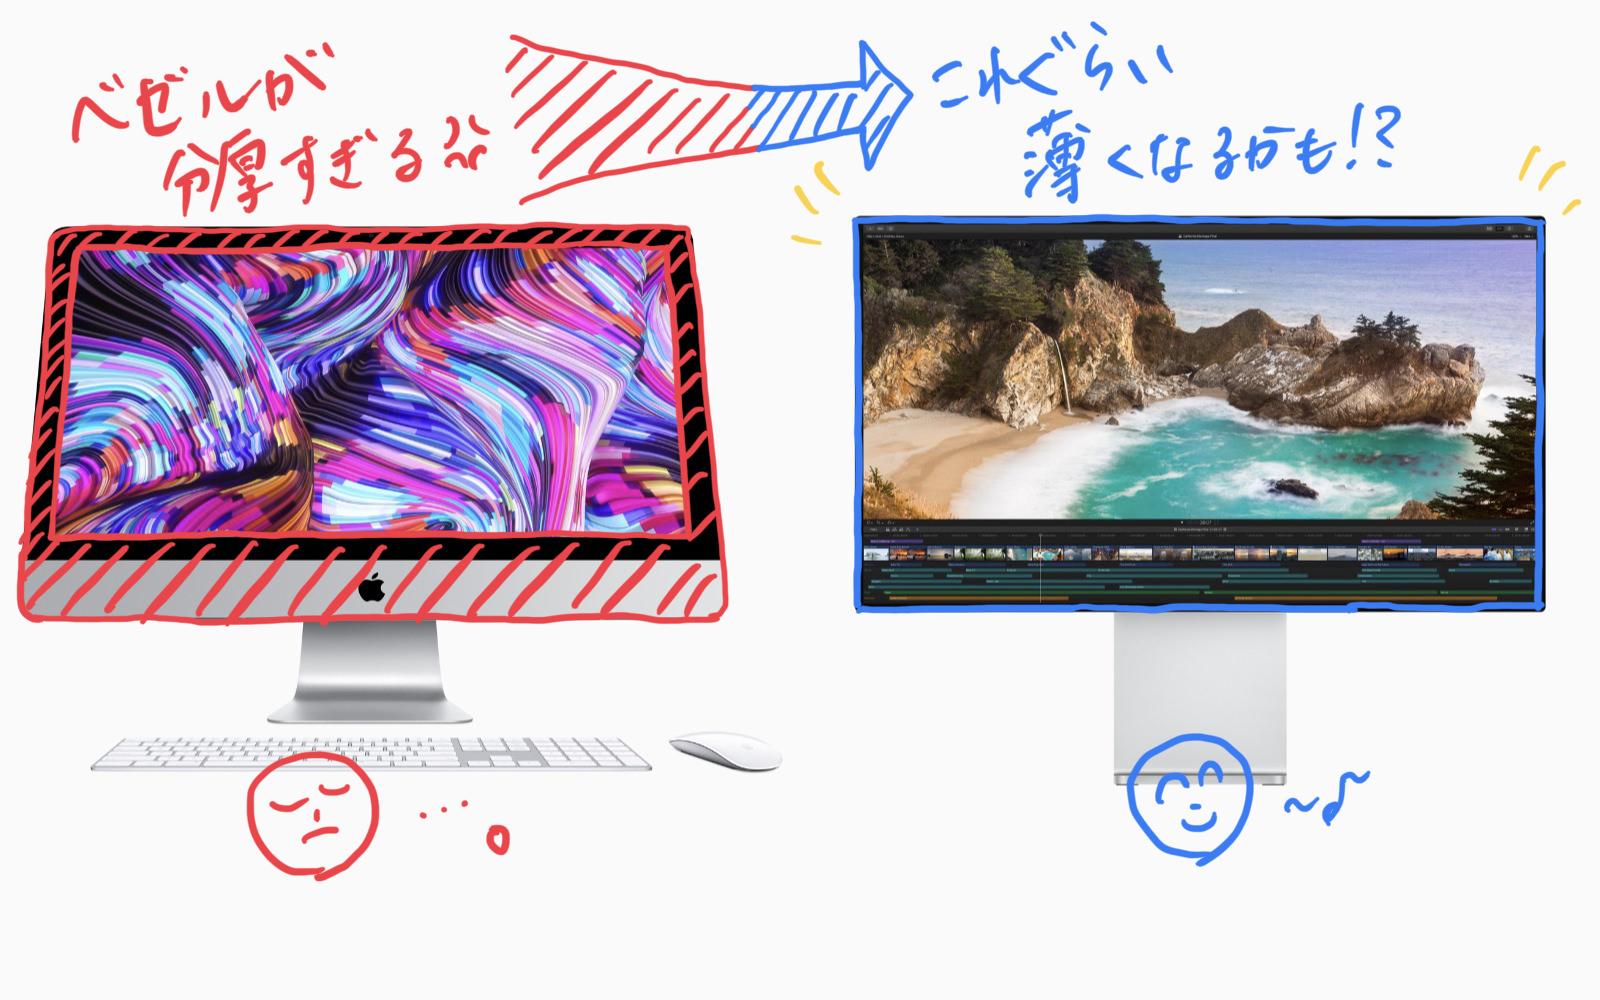 Pro Display XDR like design iMac image